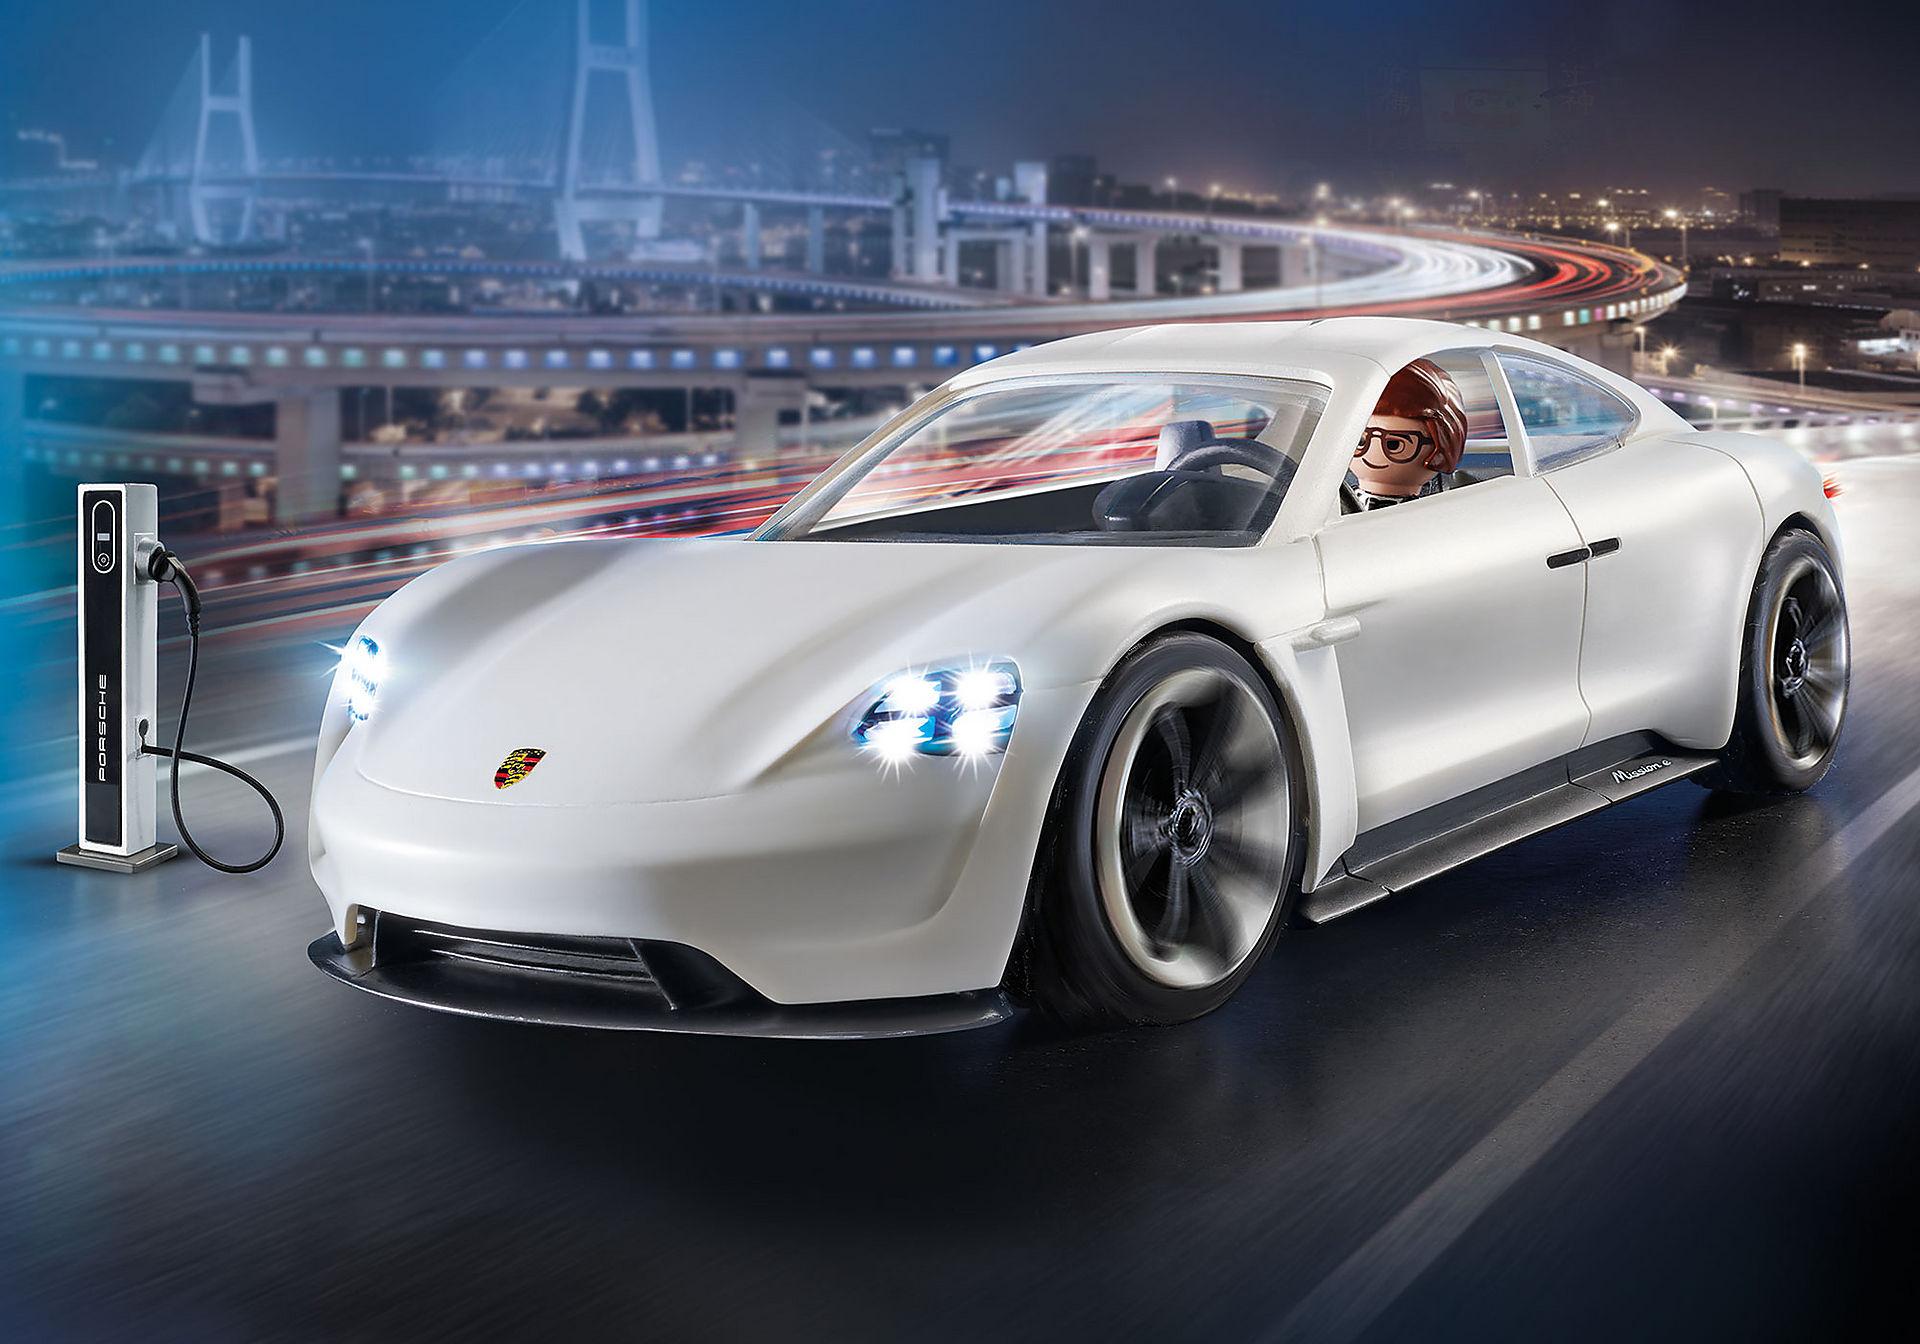 70078 PLAYMOBIL: THE MOVIE Ο Ρεξ Ντάσερ με την Porsche Mission E zoom image1